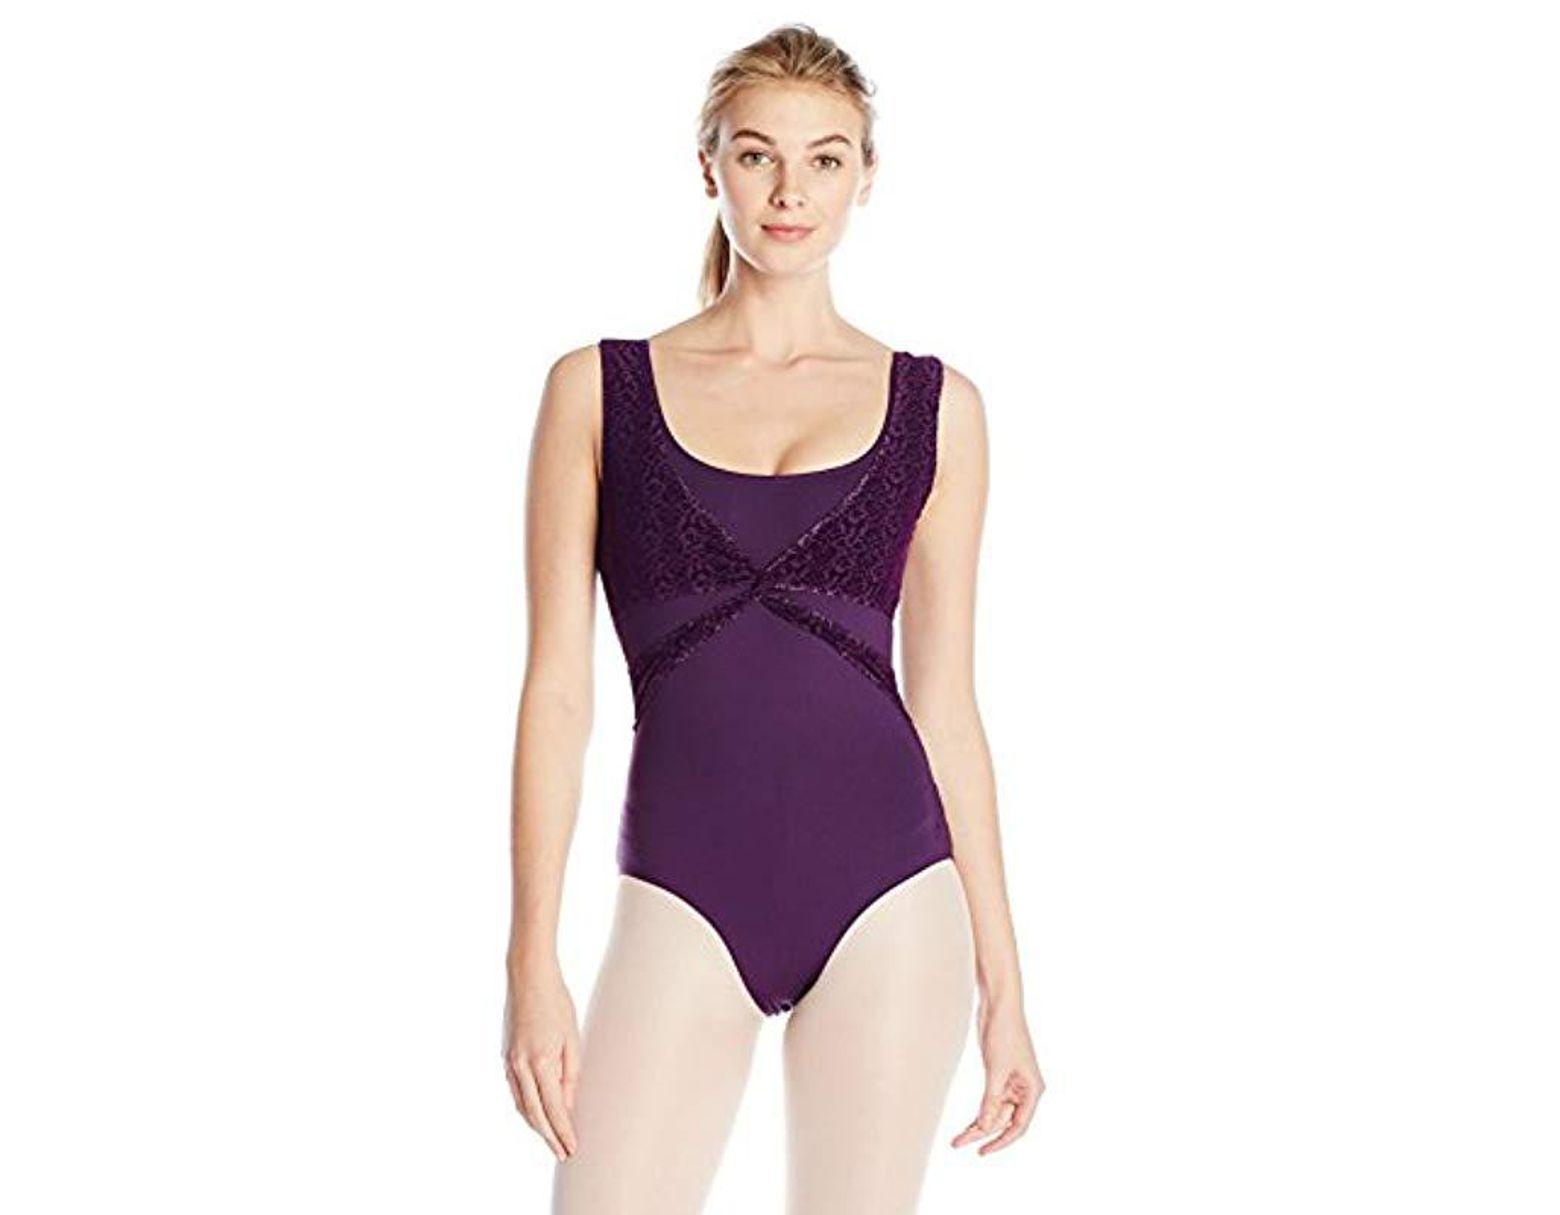 8f4c2821a9d89 Women's Purple Nycb Wrap Top Leotard